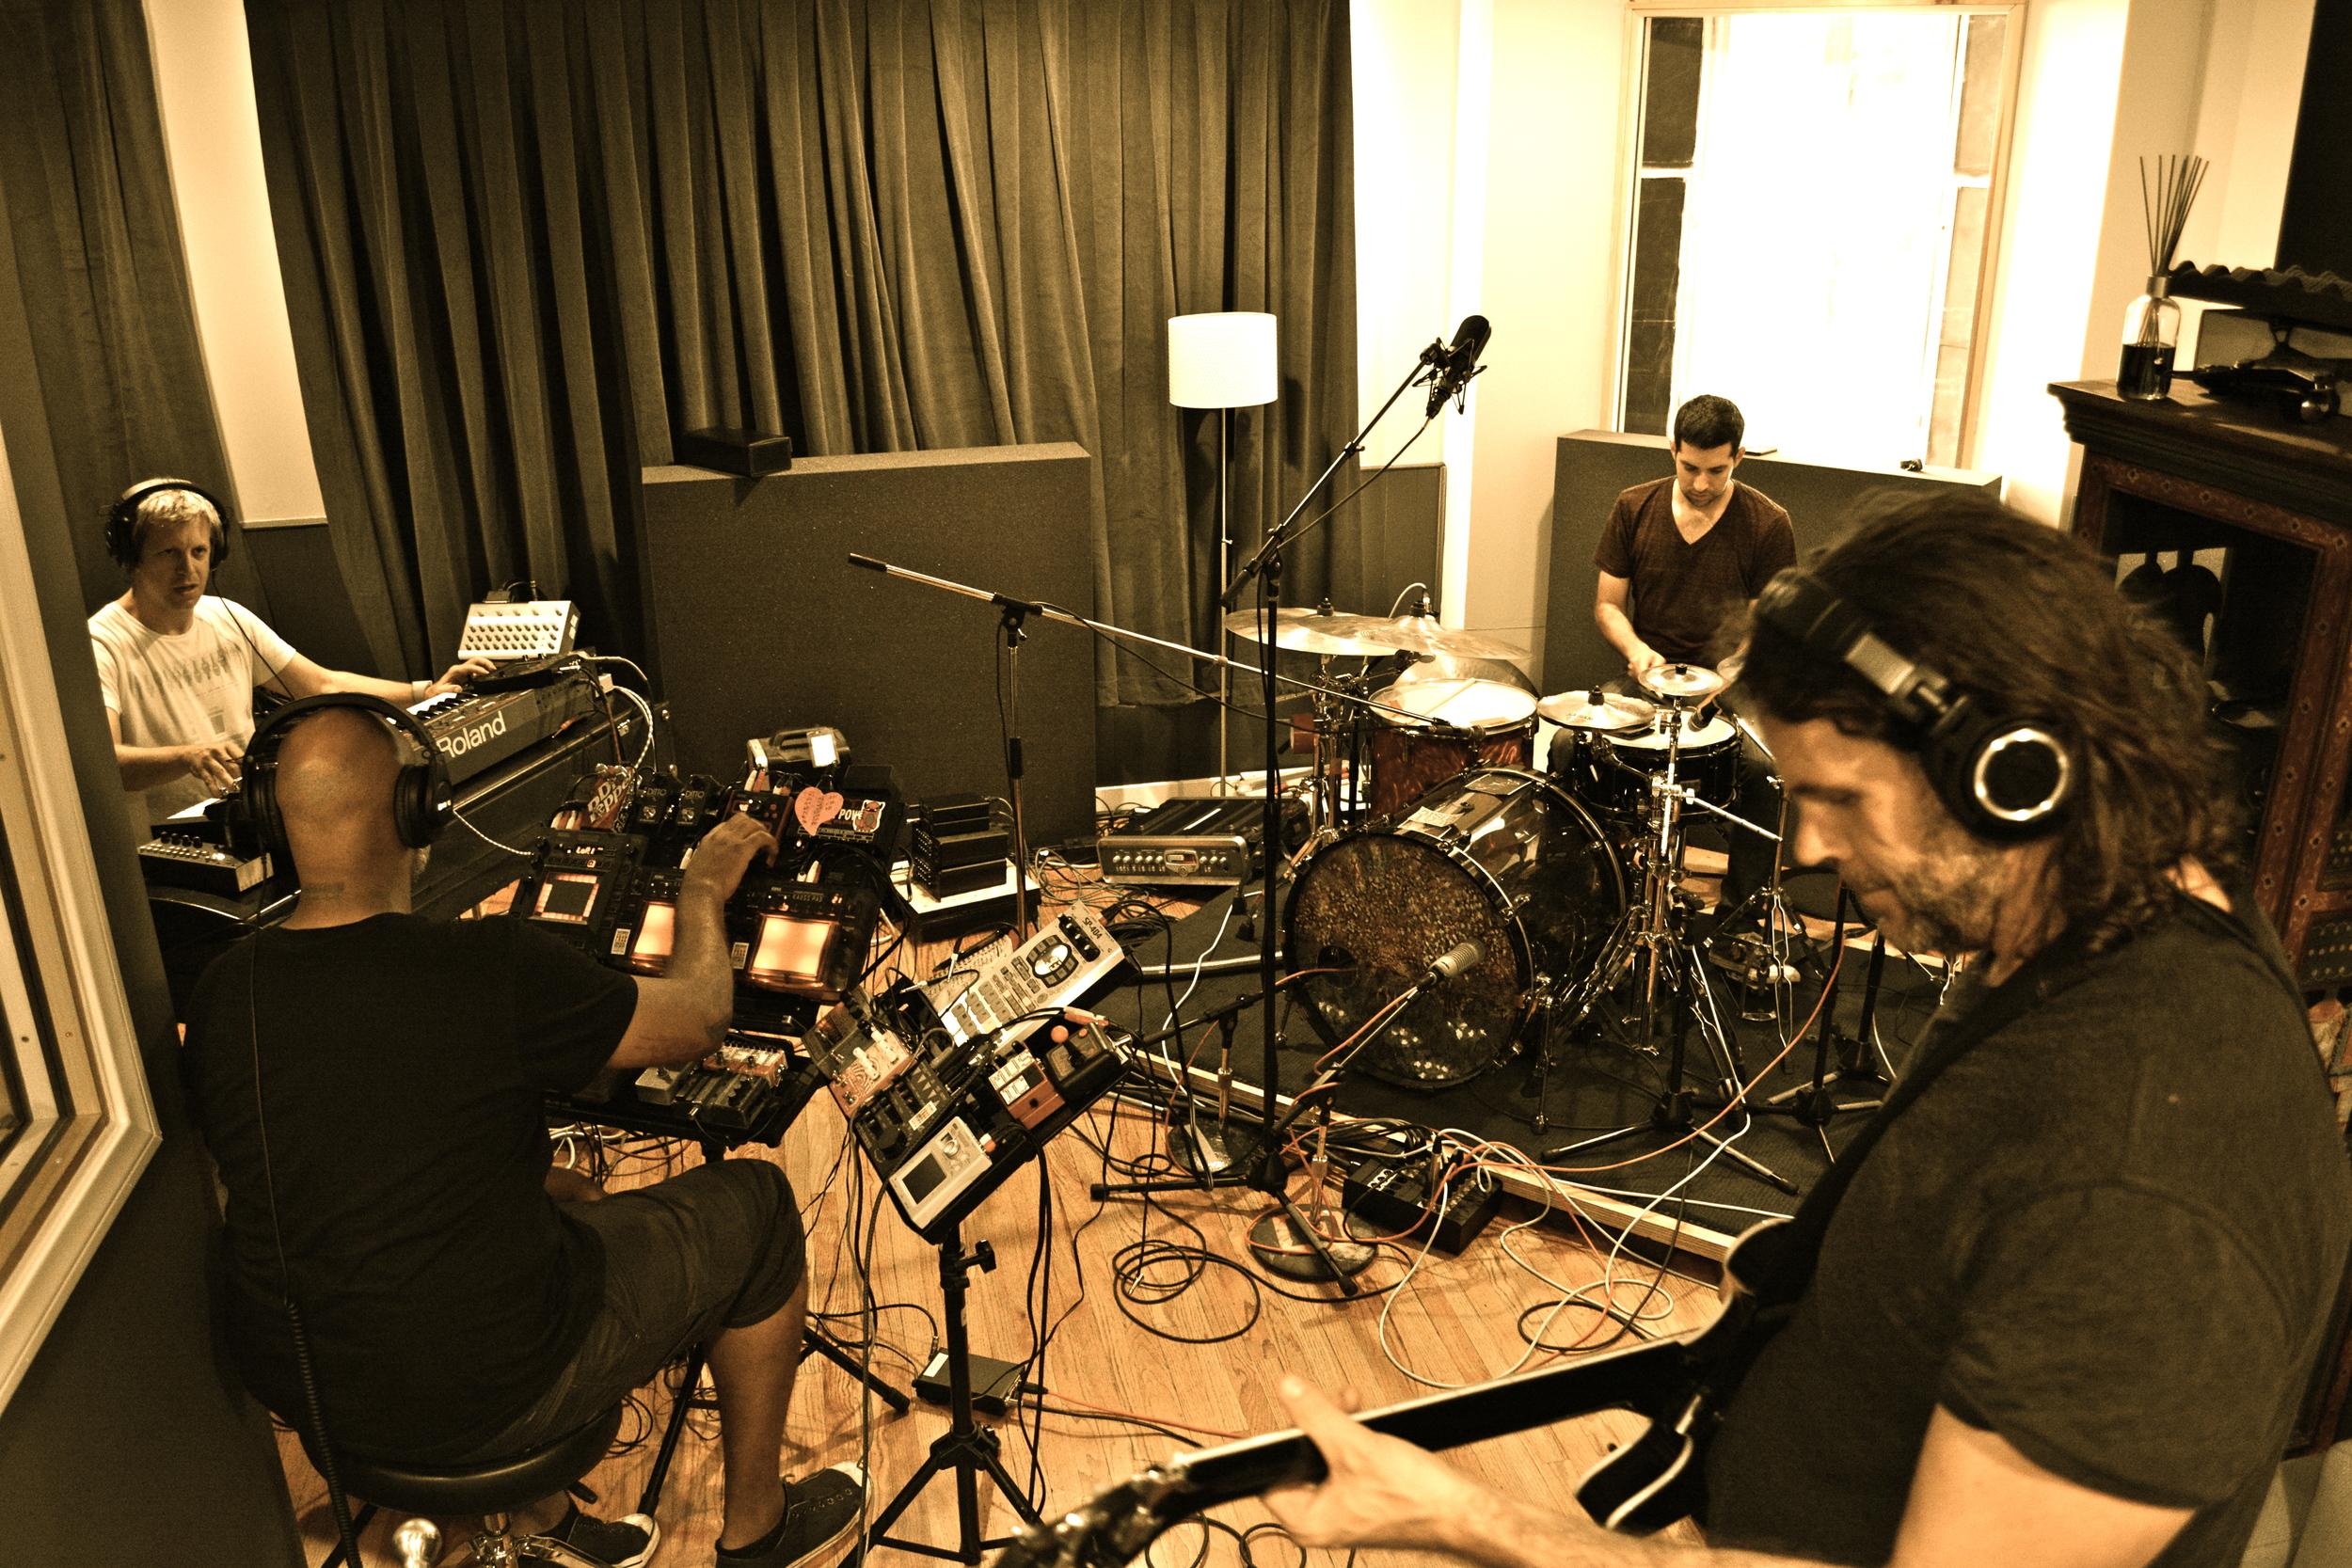 w/ Troy Ziegler, Mark Guiliana, Tim Lefebvre making Beat Music LA Aug. 19, 2013